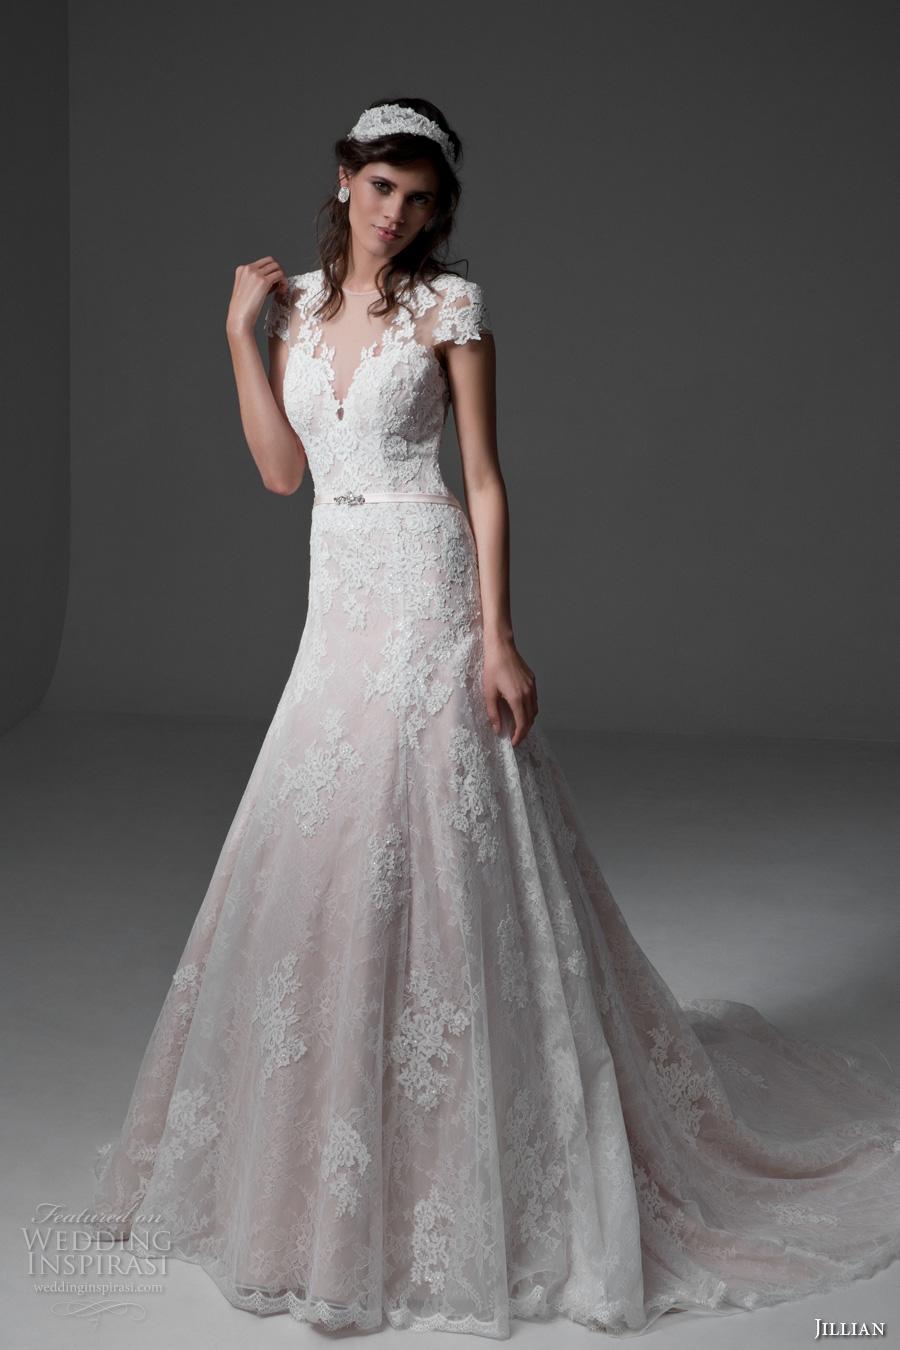 Jillian 2017 wedding dresses artemisia bridal for Drop sleeve wedding dress